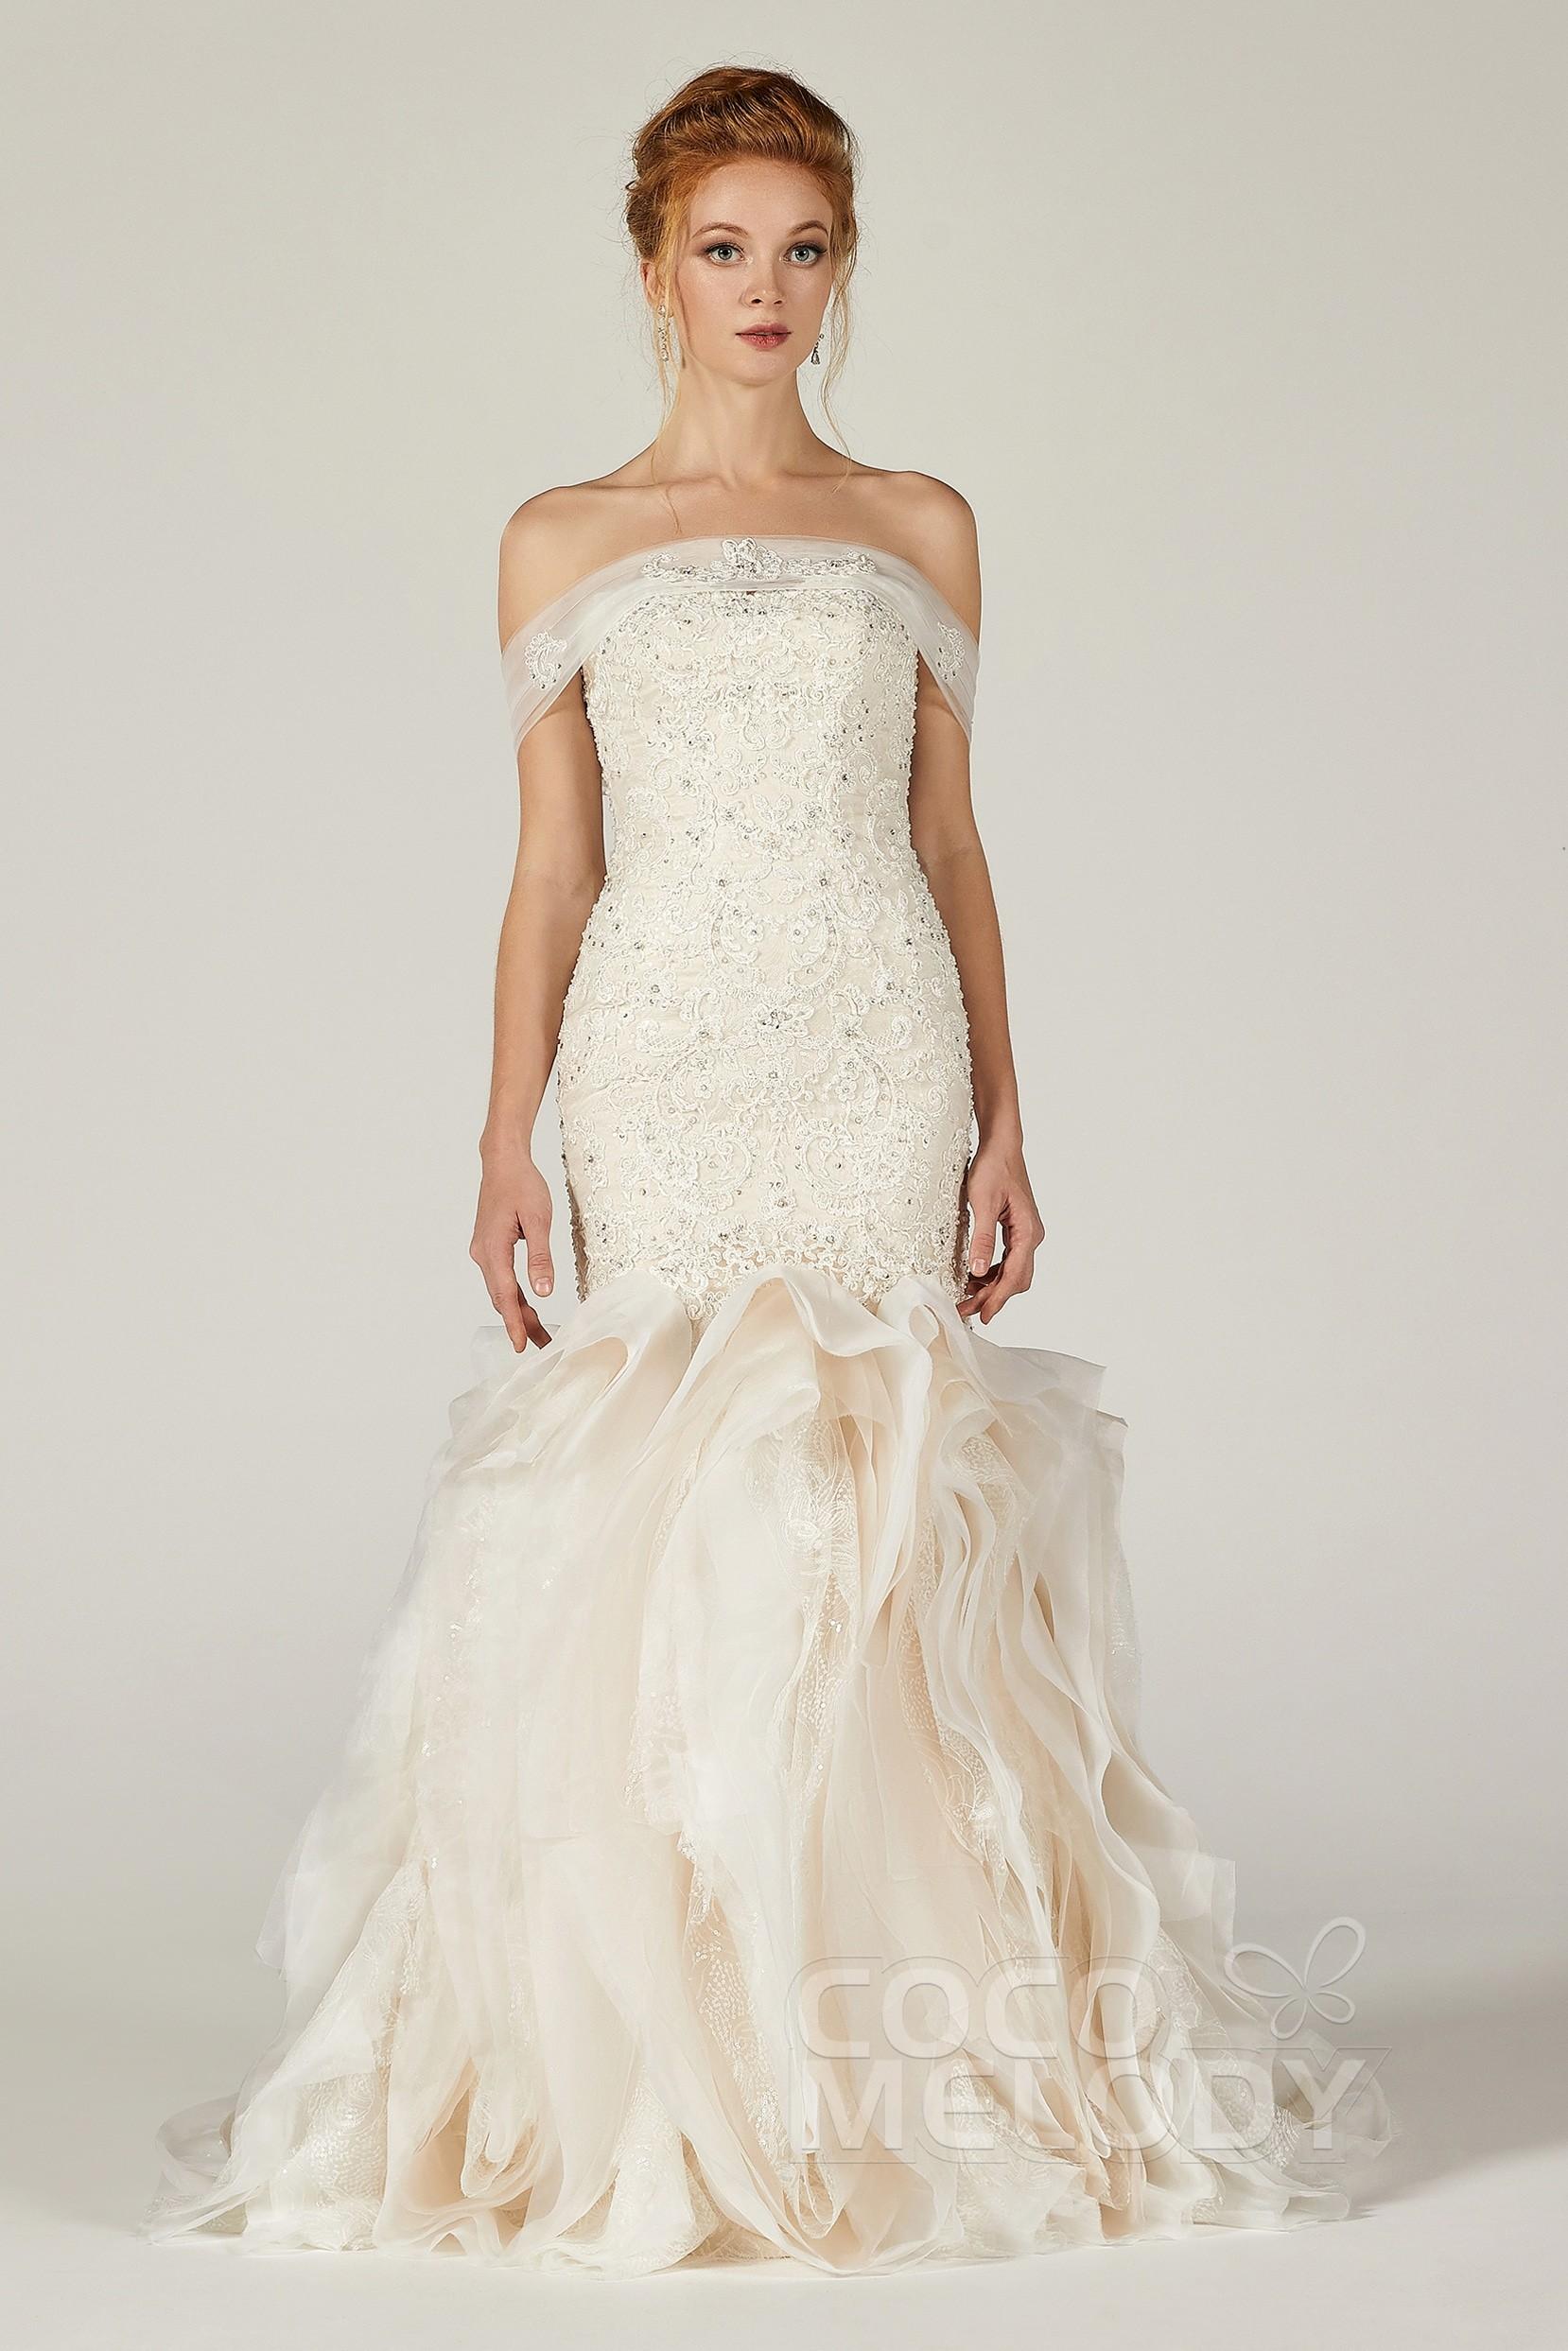 Sweetheart Court Tulle Satin Sleeveless Wedding Dress ...